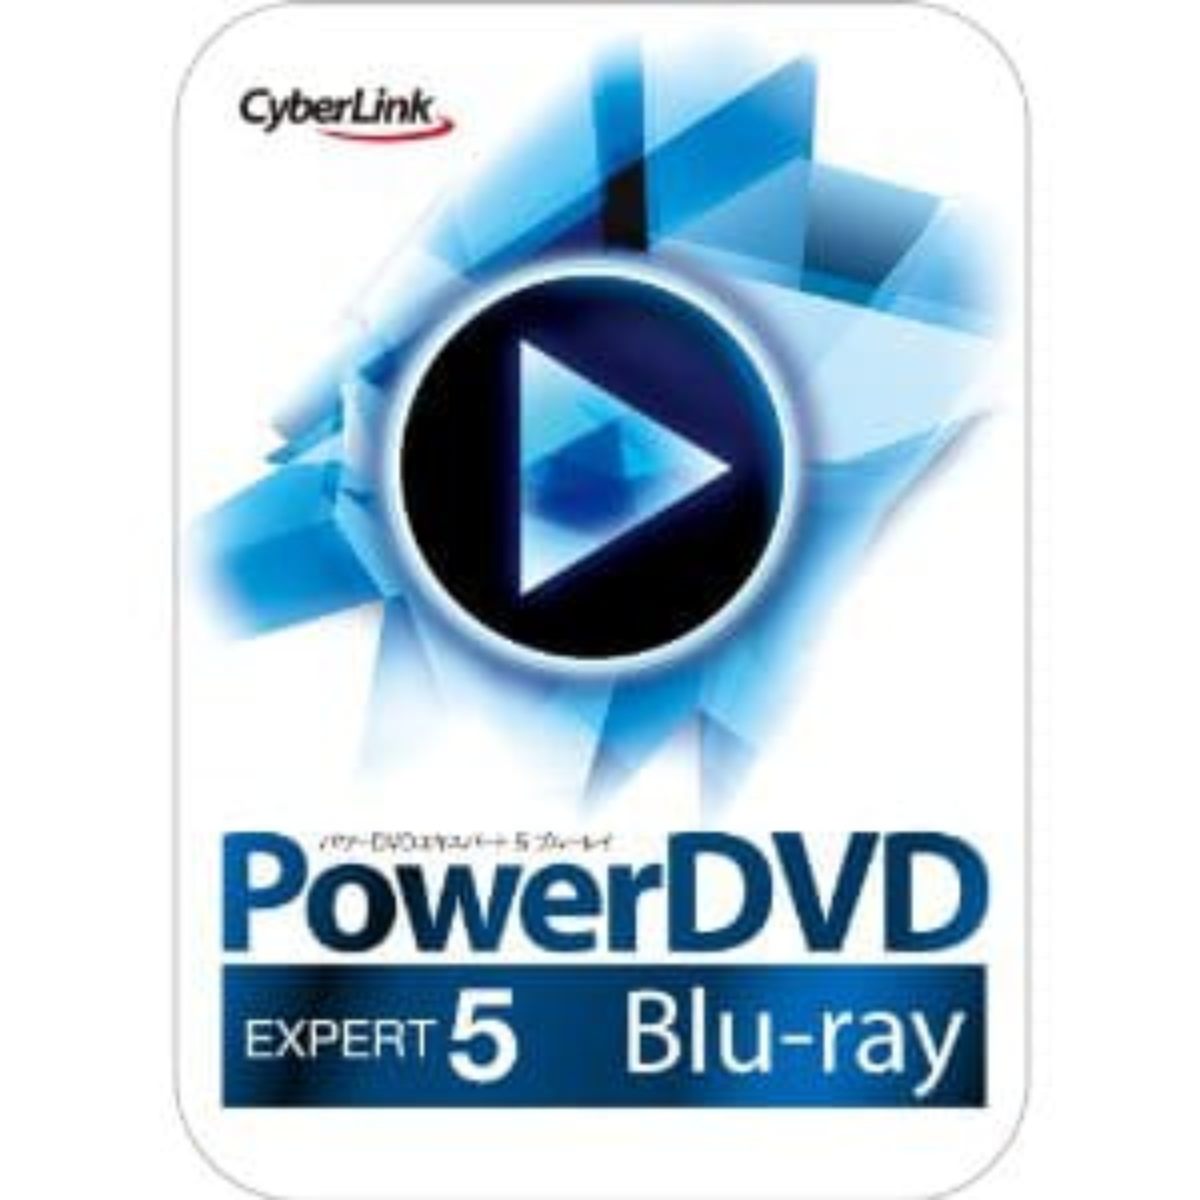 PowerDVD™ EXPERT